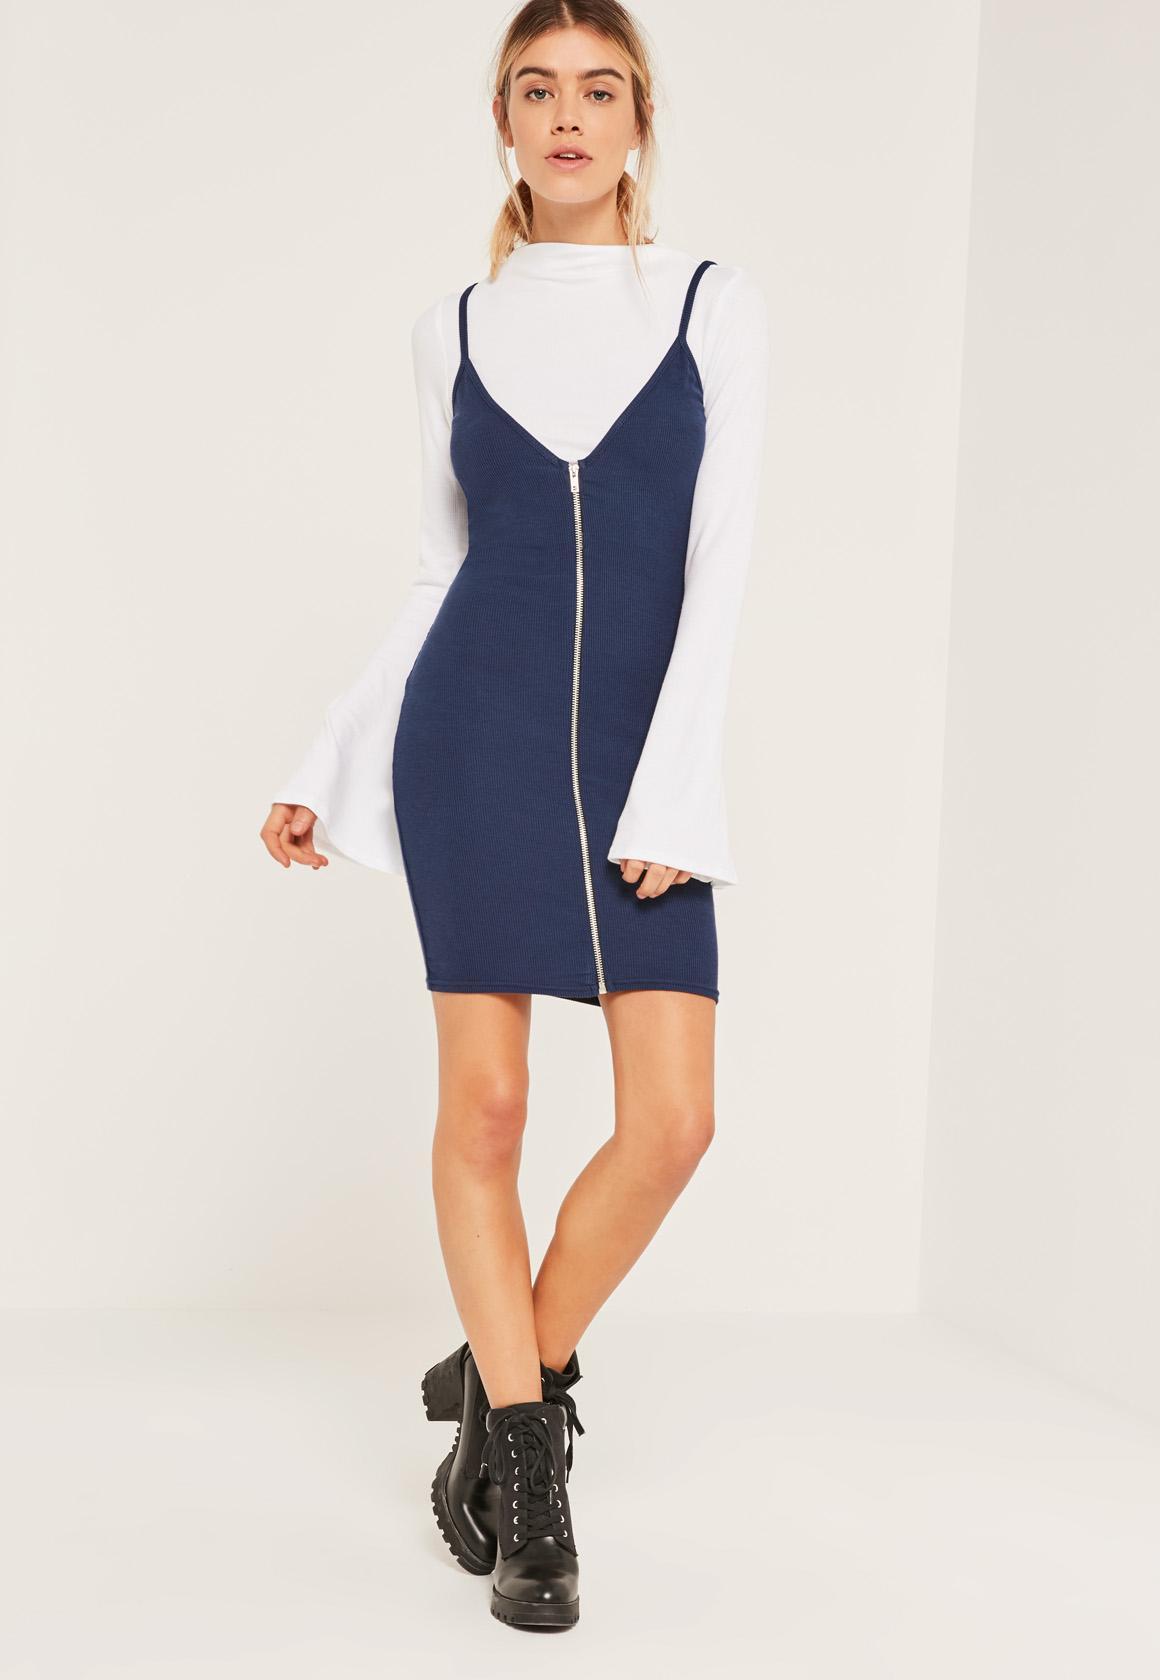 Blue Flared Sleeve Zip 2 in 1 Dress